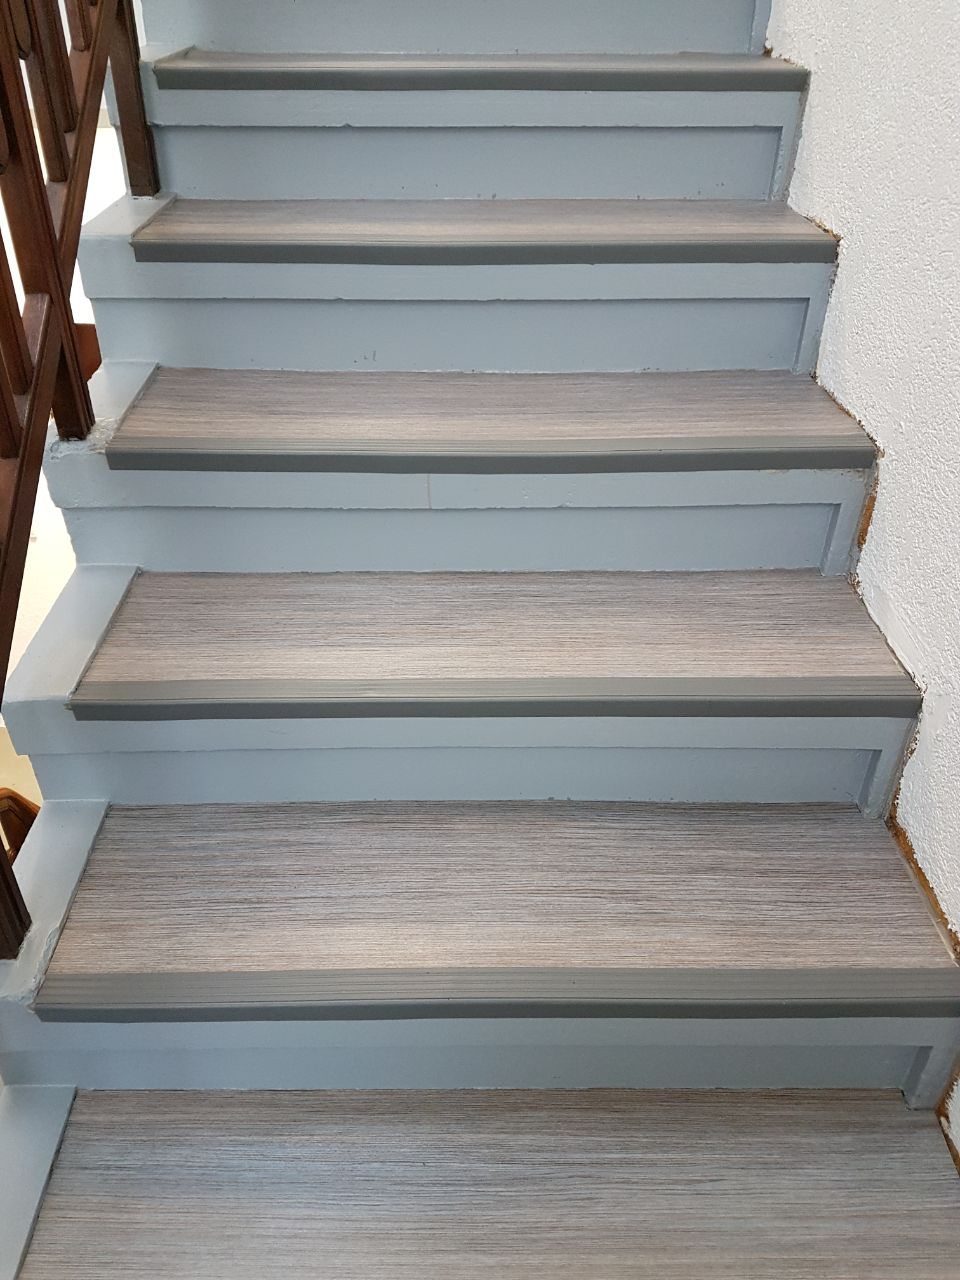 erneuerung treppenhaus in d sseldorf bodenbelag koch gmbh co kg parkett laminat d sseldorf. Black Bedroom Furniture Sets. Home Design Ideas